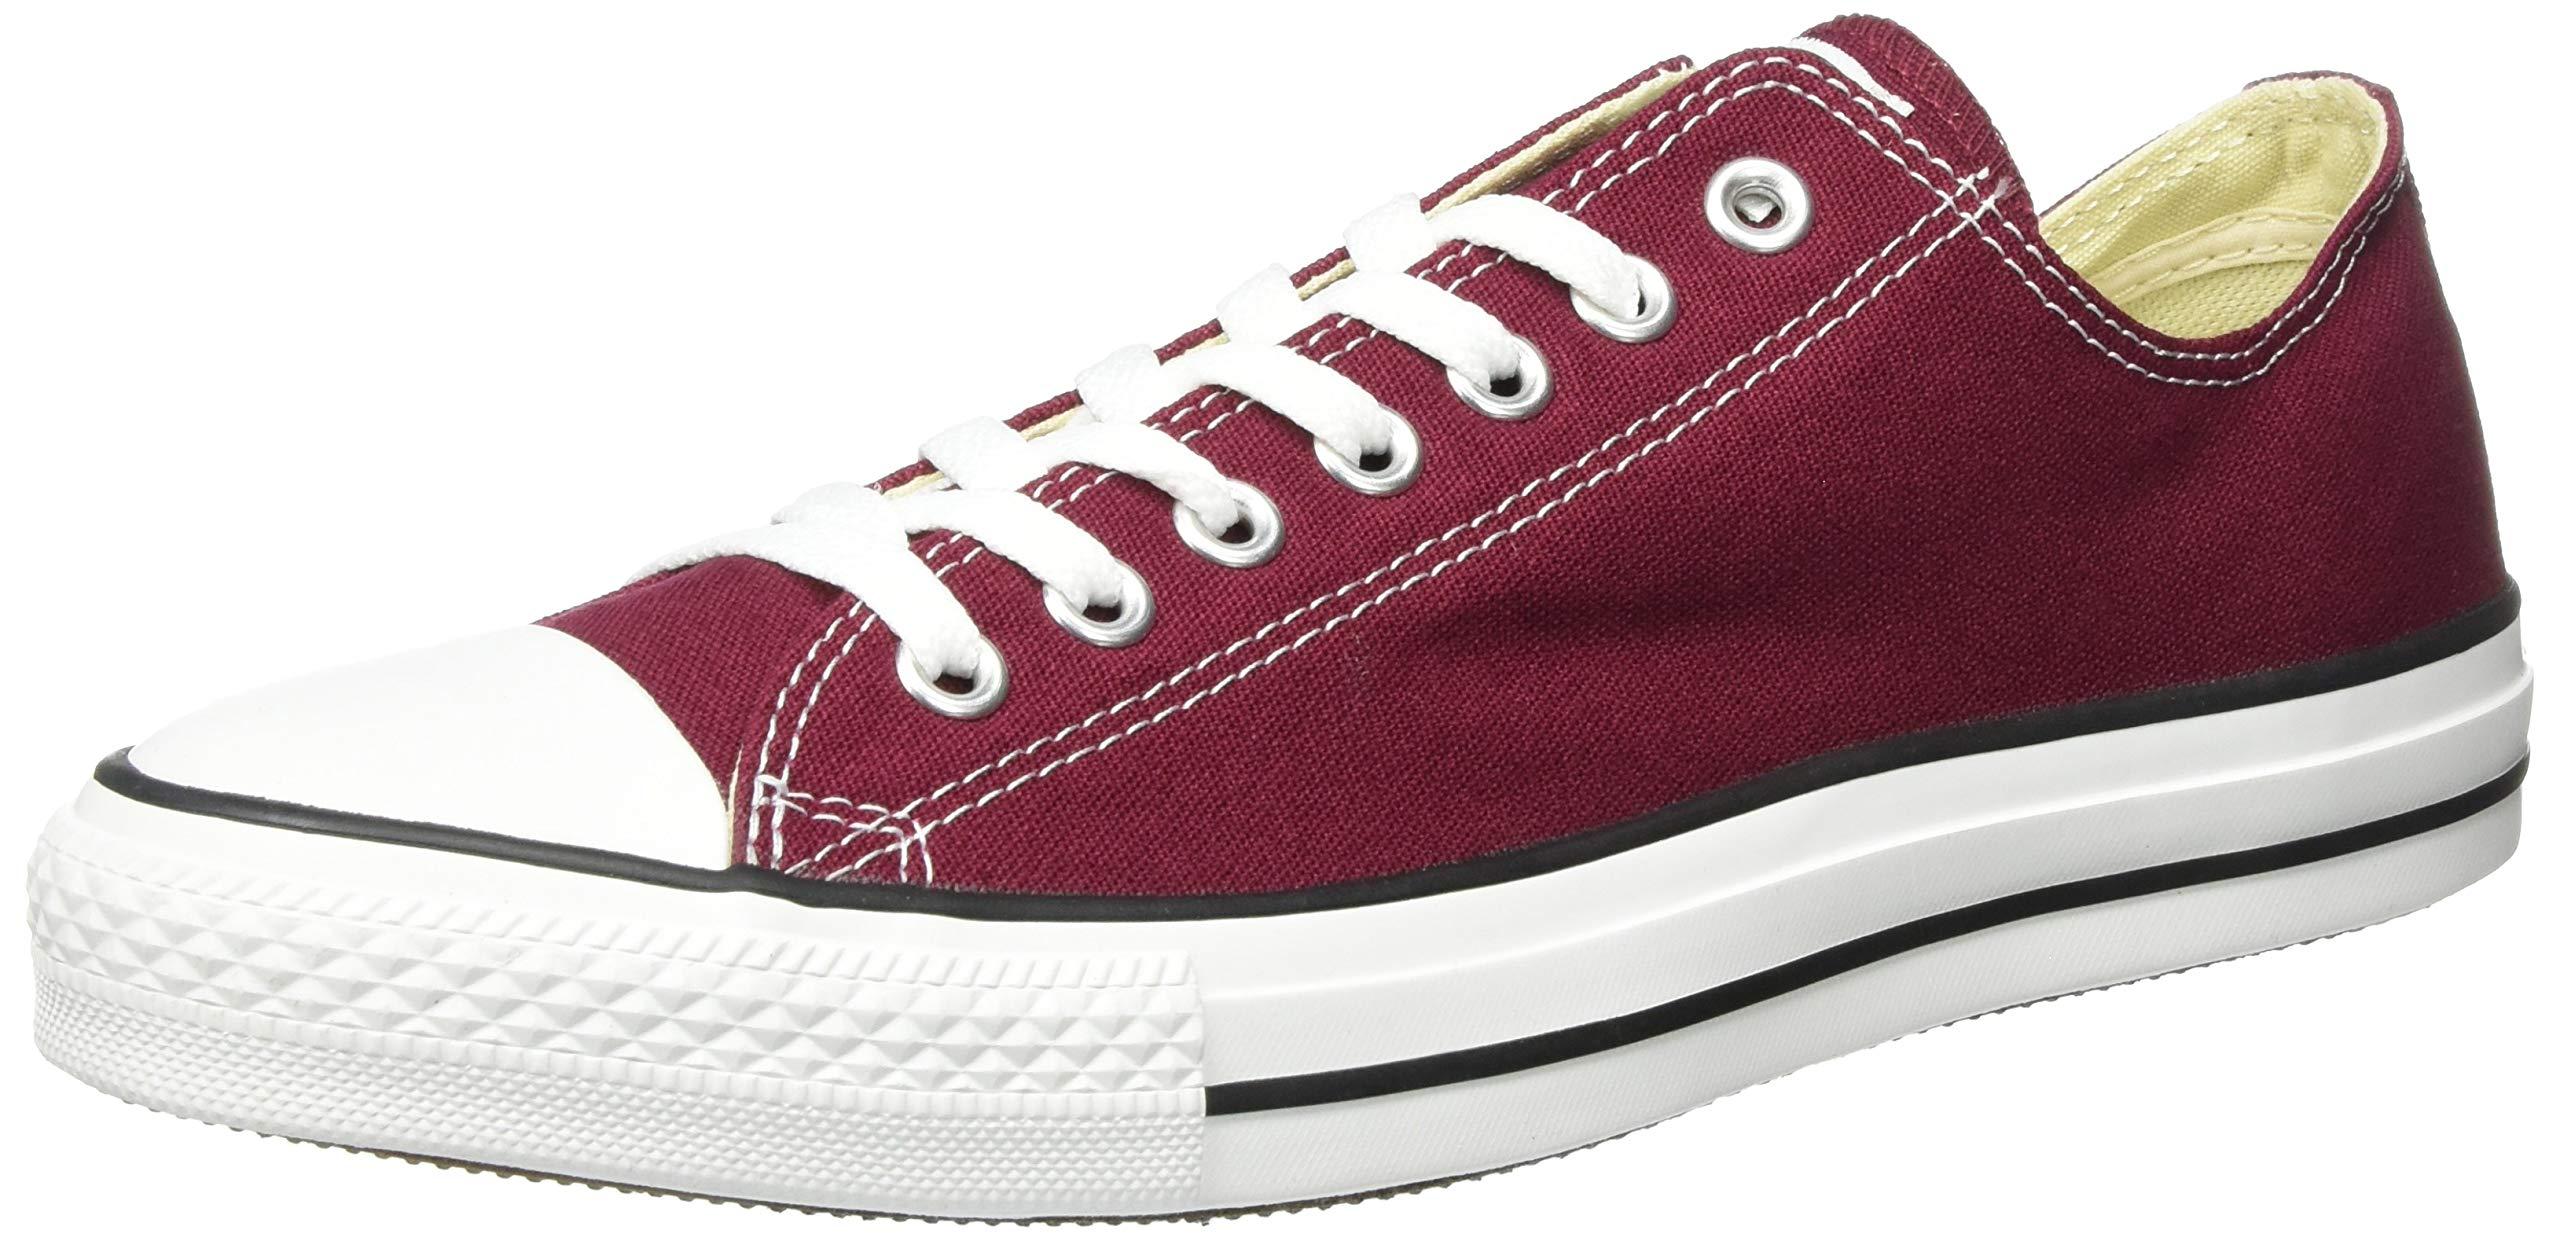 63833f4abeab Galleon - Converse Unisex Chuck Taylor All Star Low Top Maroon Sneakers -  10.5 B(M) US Women   8.5 D(M) US Men